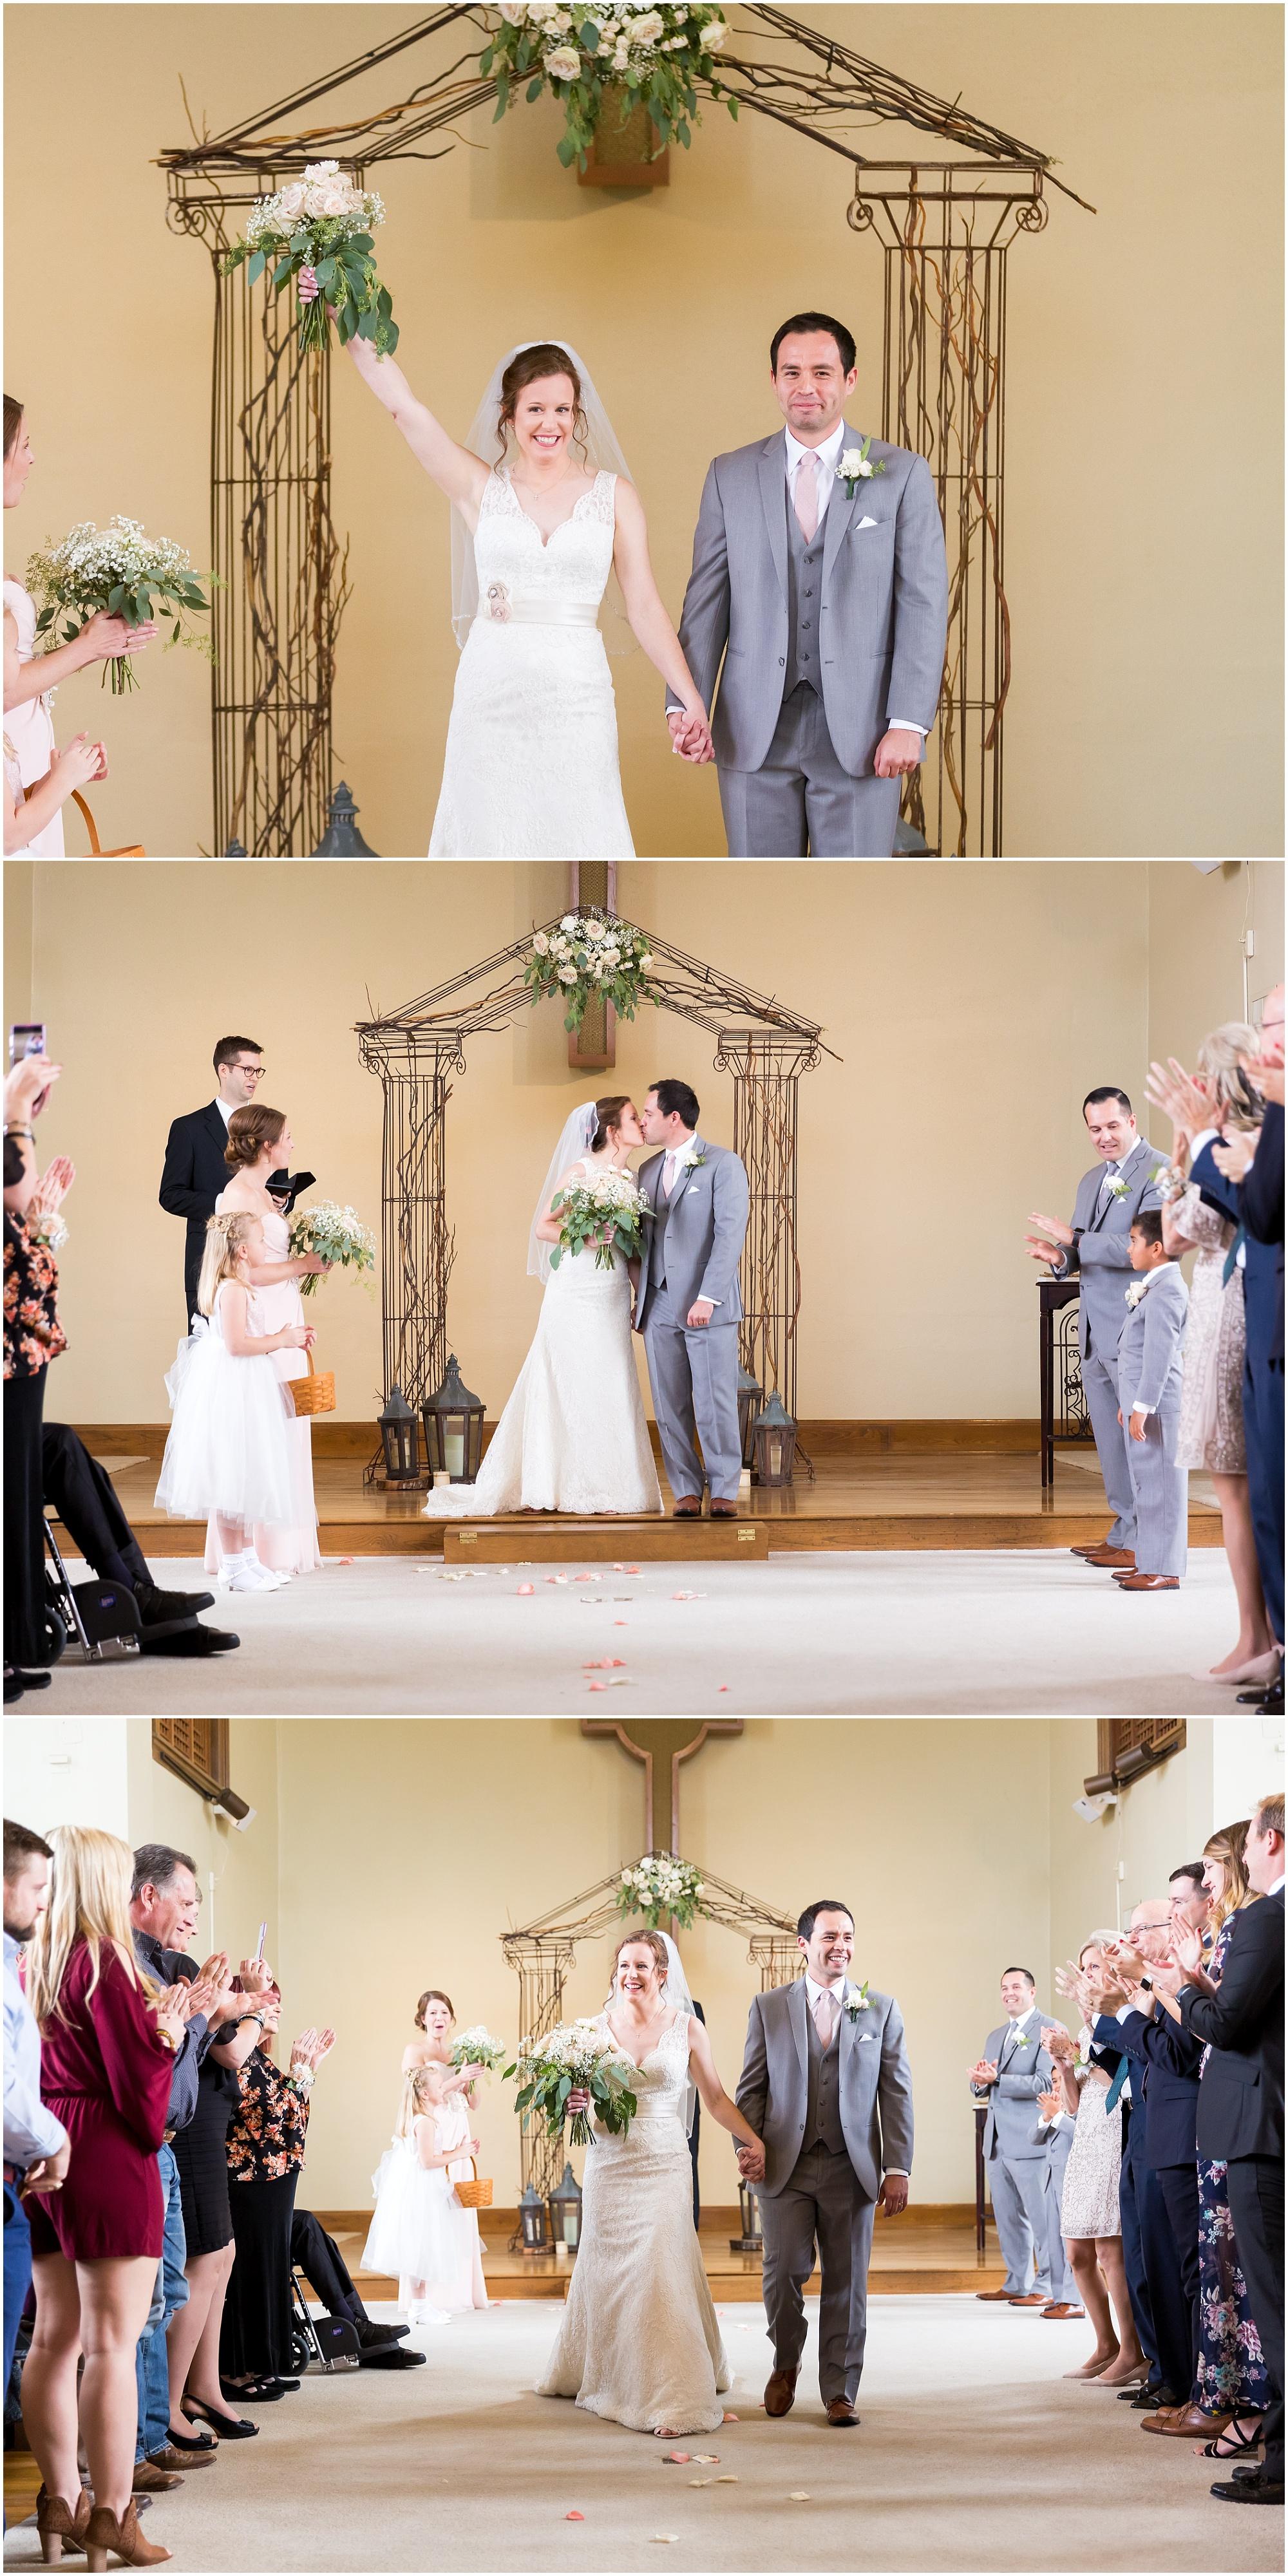 Downtown-Waco-Fall-Wedding_0021.jpg